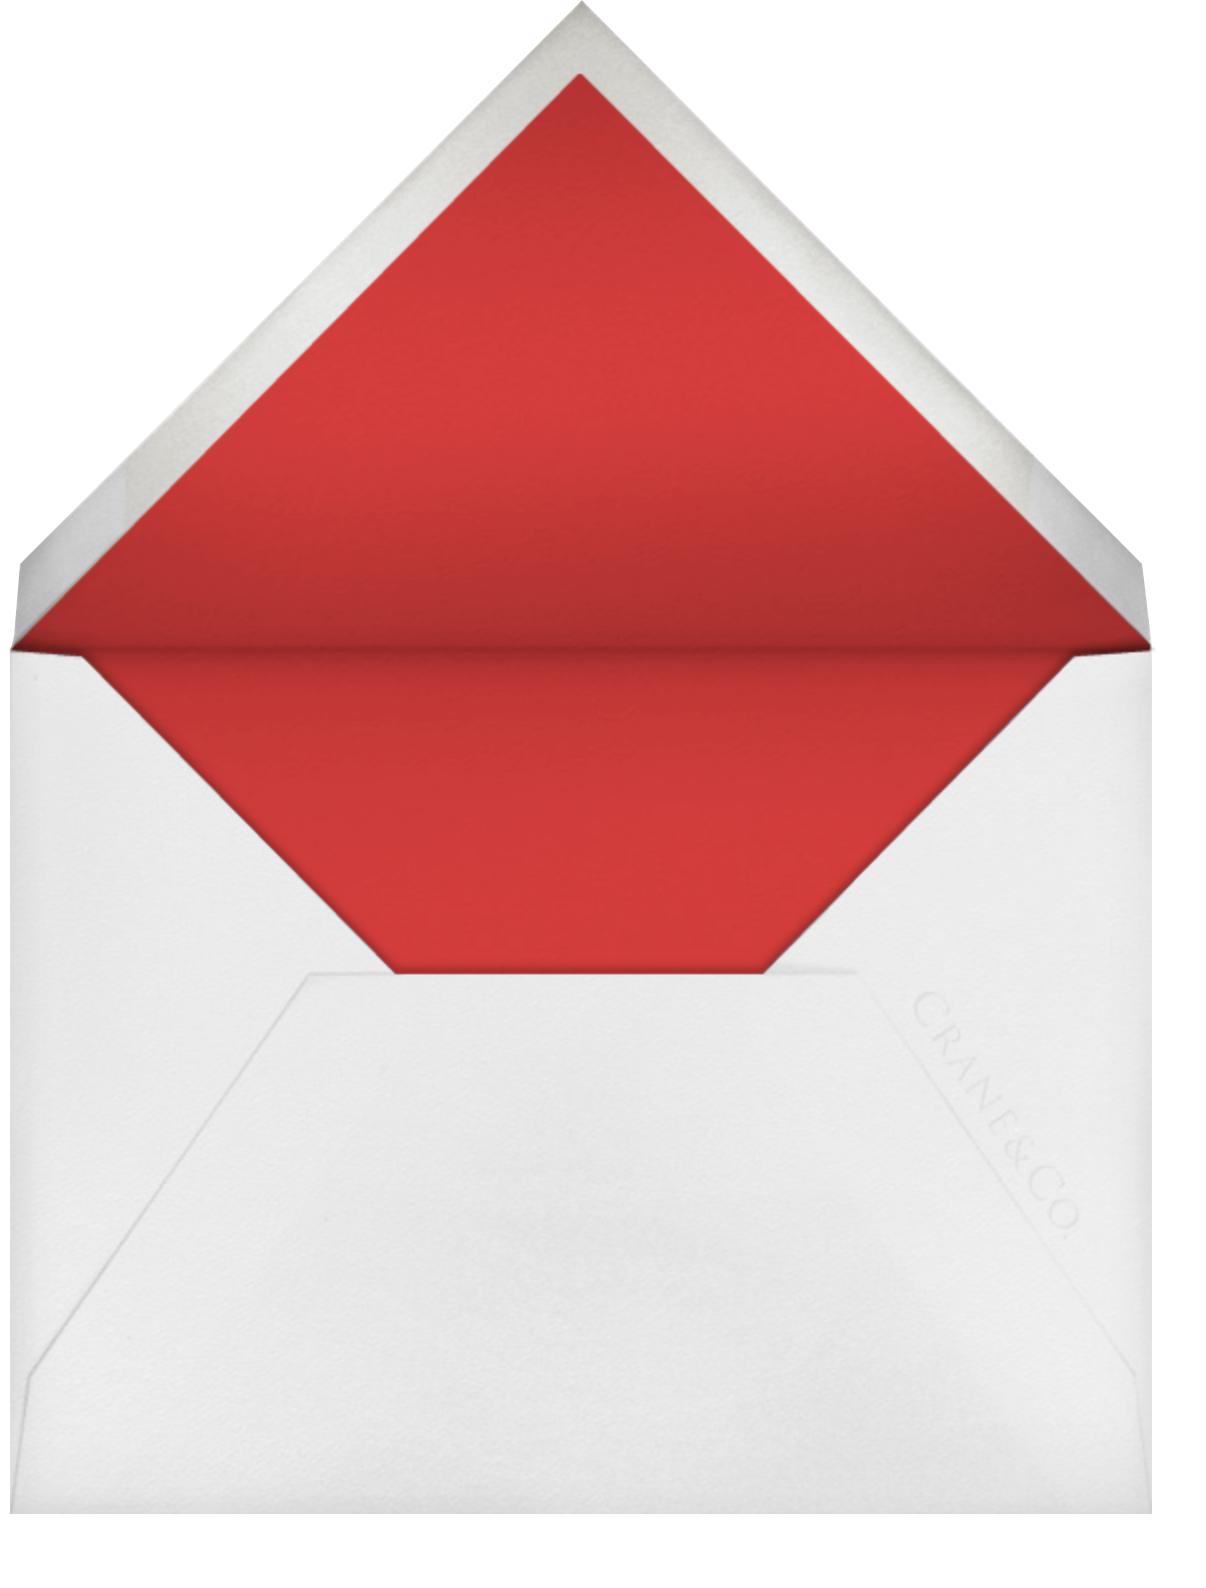 Tie the Knot (Stationery) - Red - Oscar de la Renta - Personalized stationery - envelope back